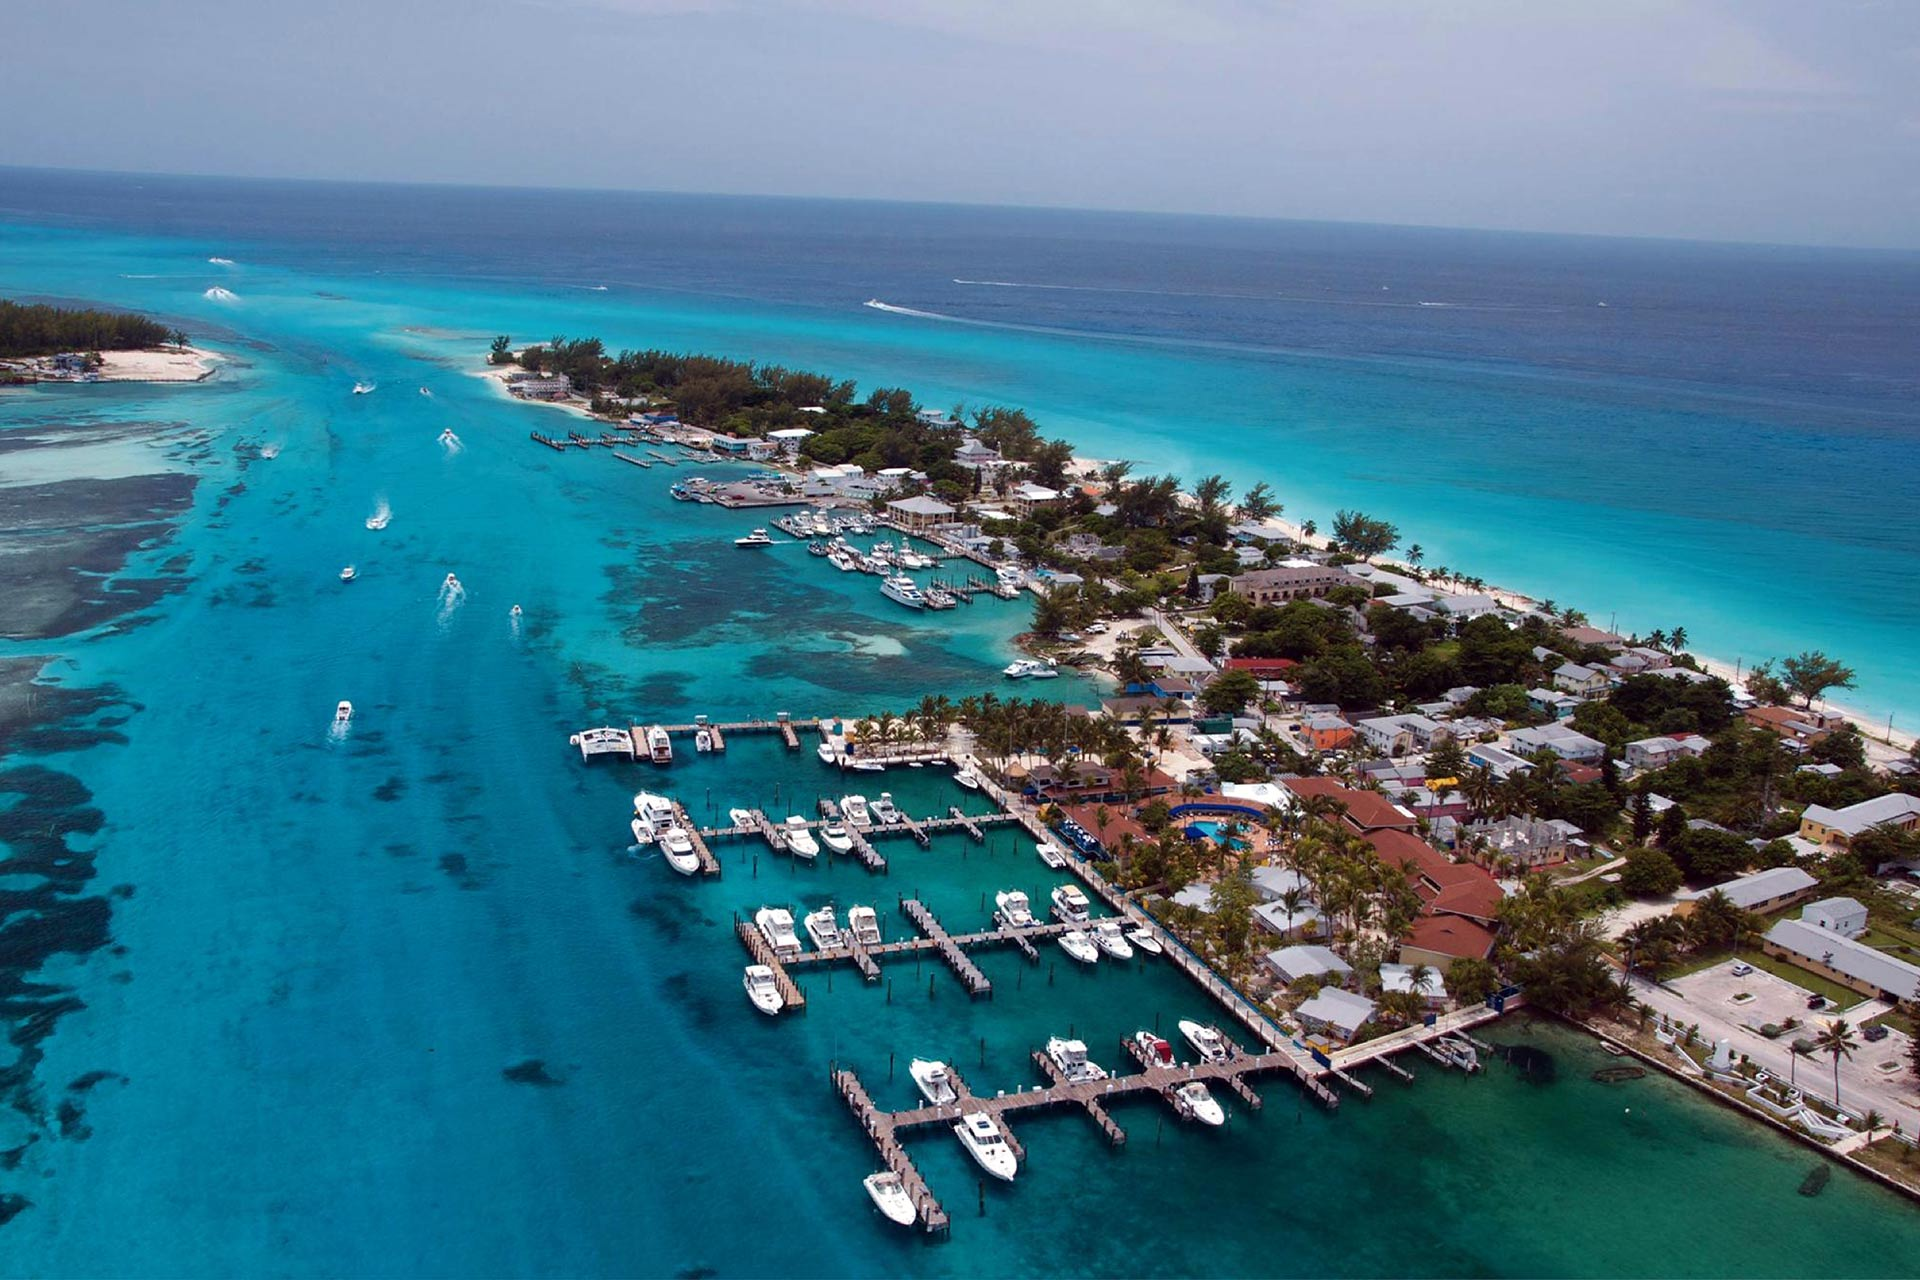 Bimini Big Game Club Resort and Marina in the Bahamas